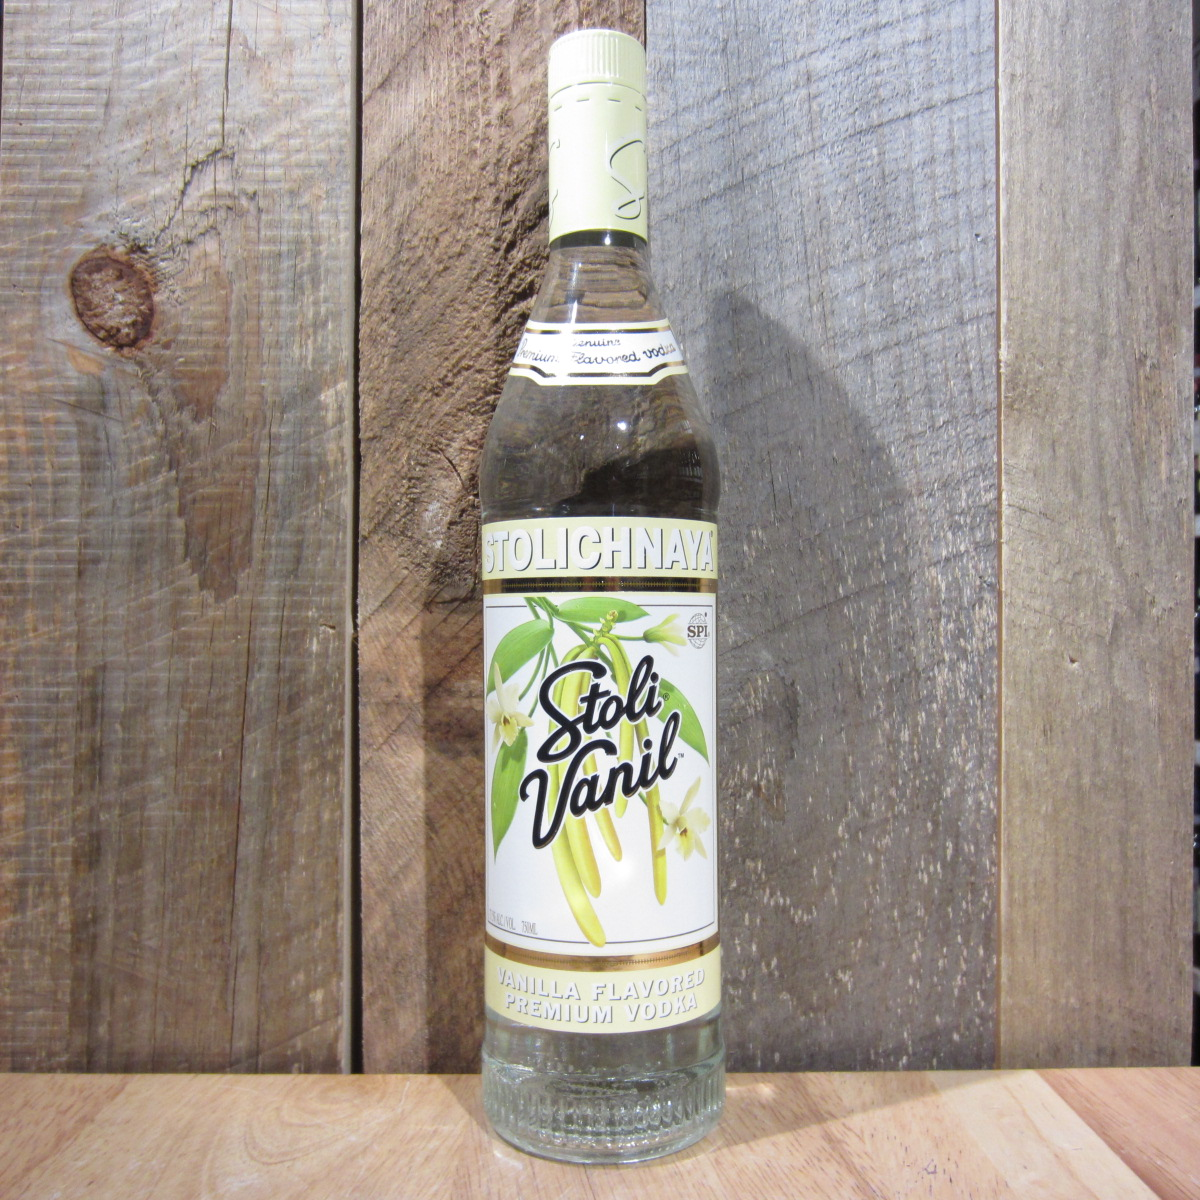 Stolichnaya Vanil Vanilla Vodka, Russia - Wine-Searcher